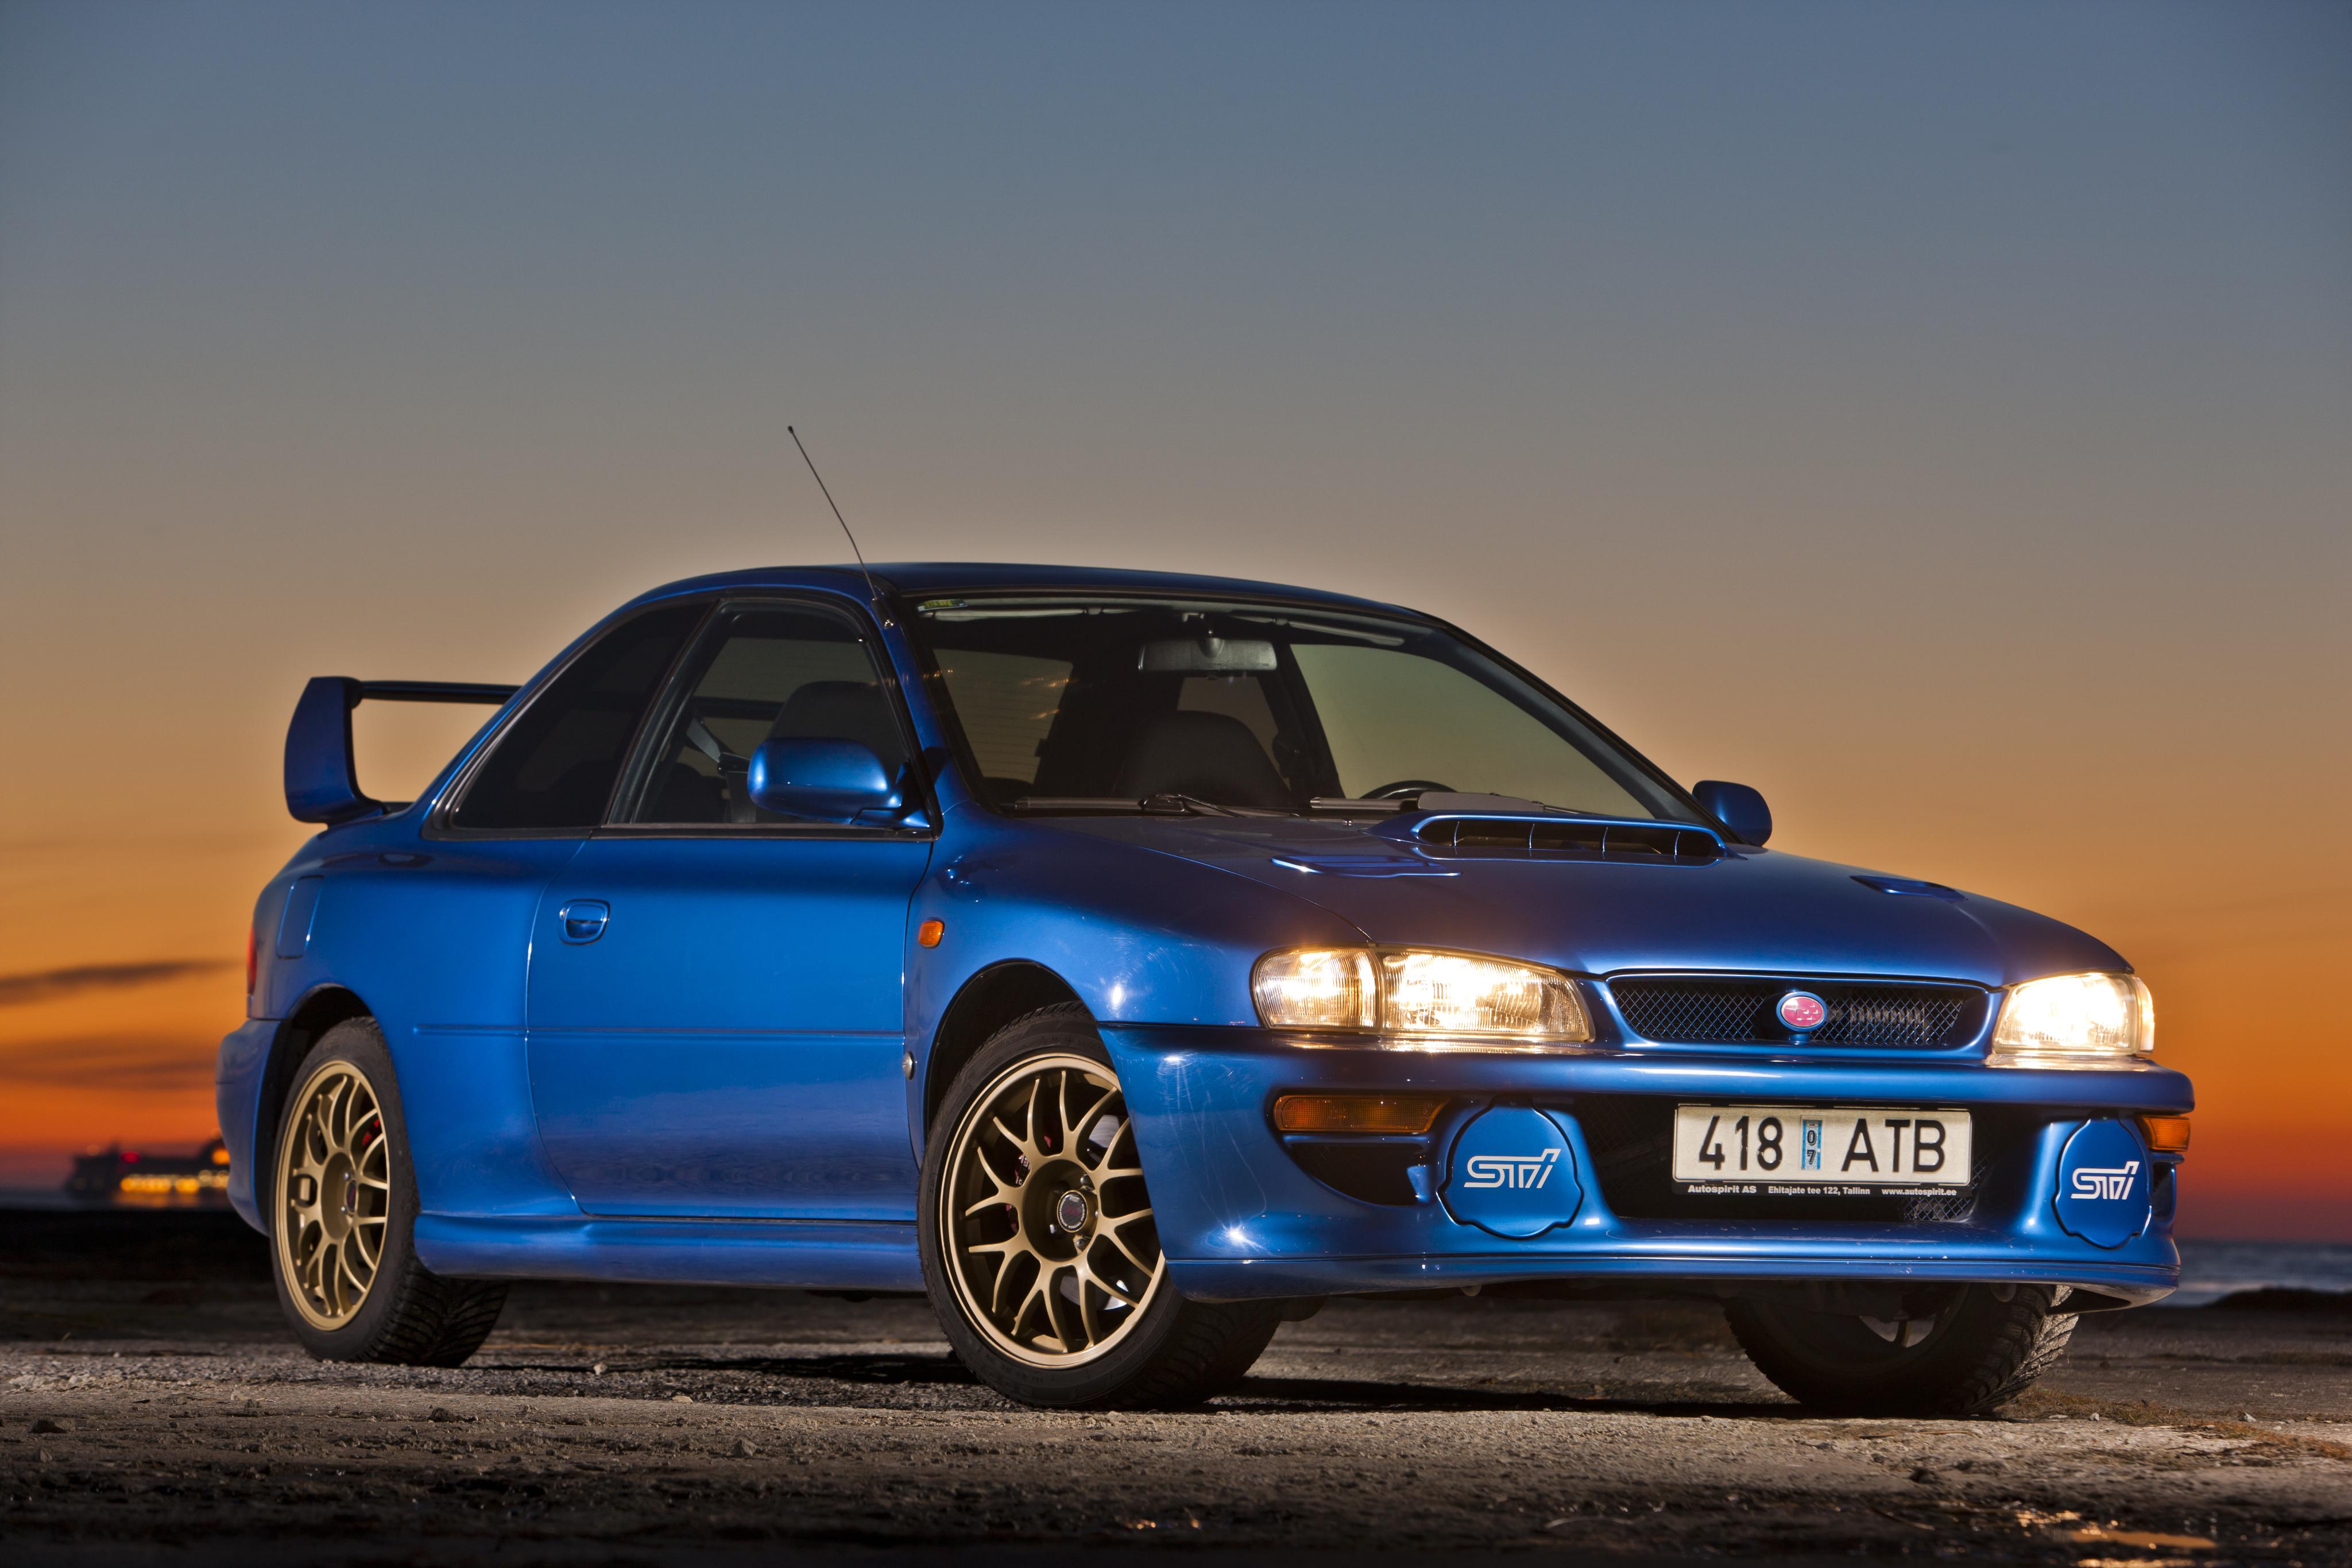 Subaru Impreza 22b STI 1998